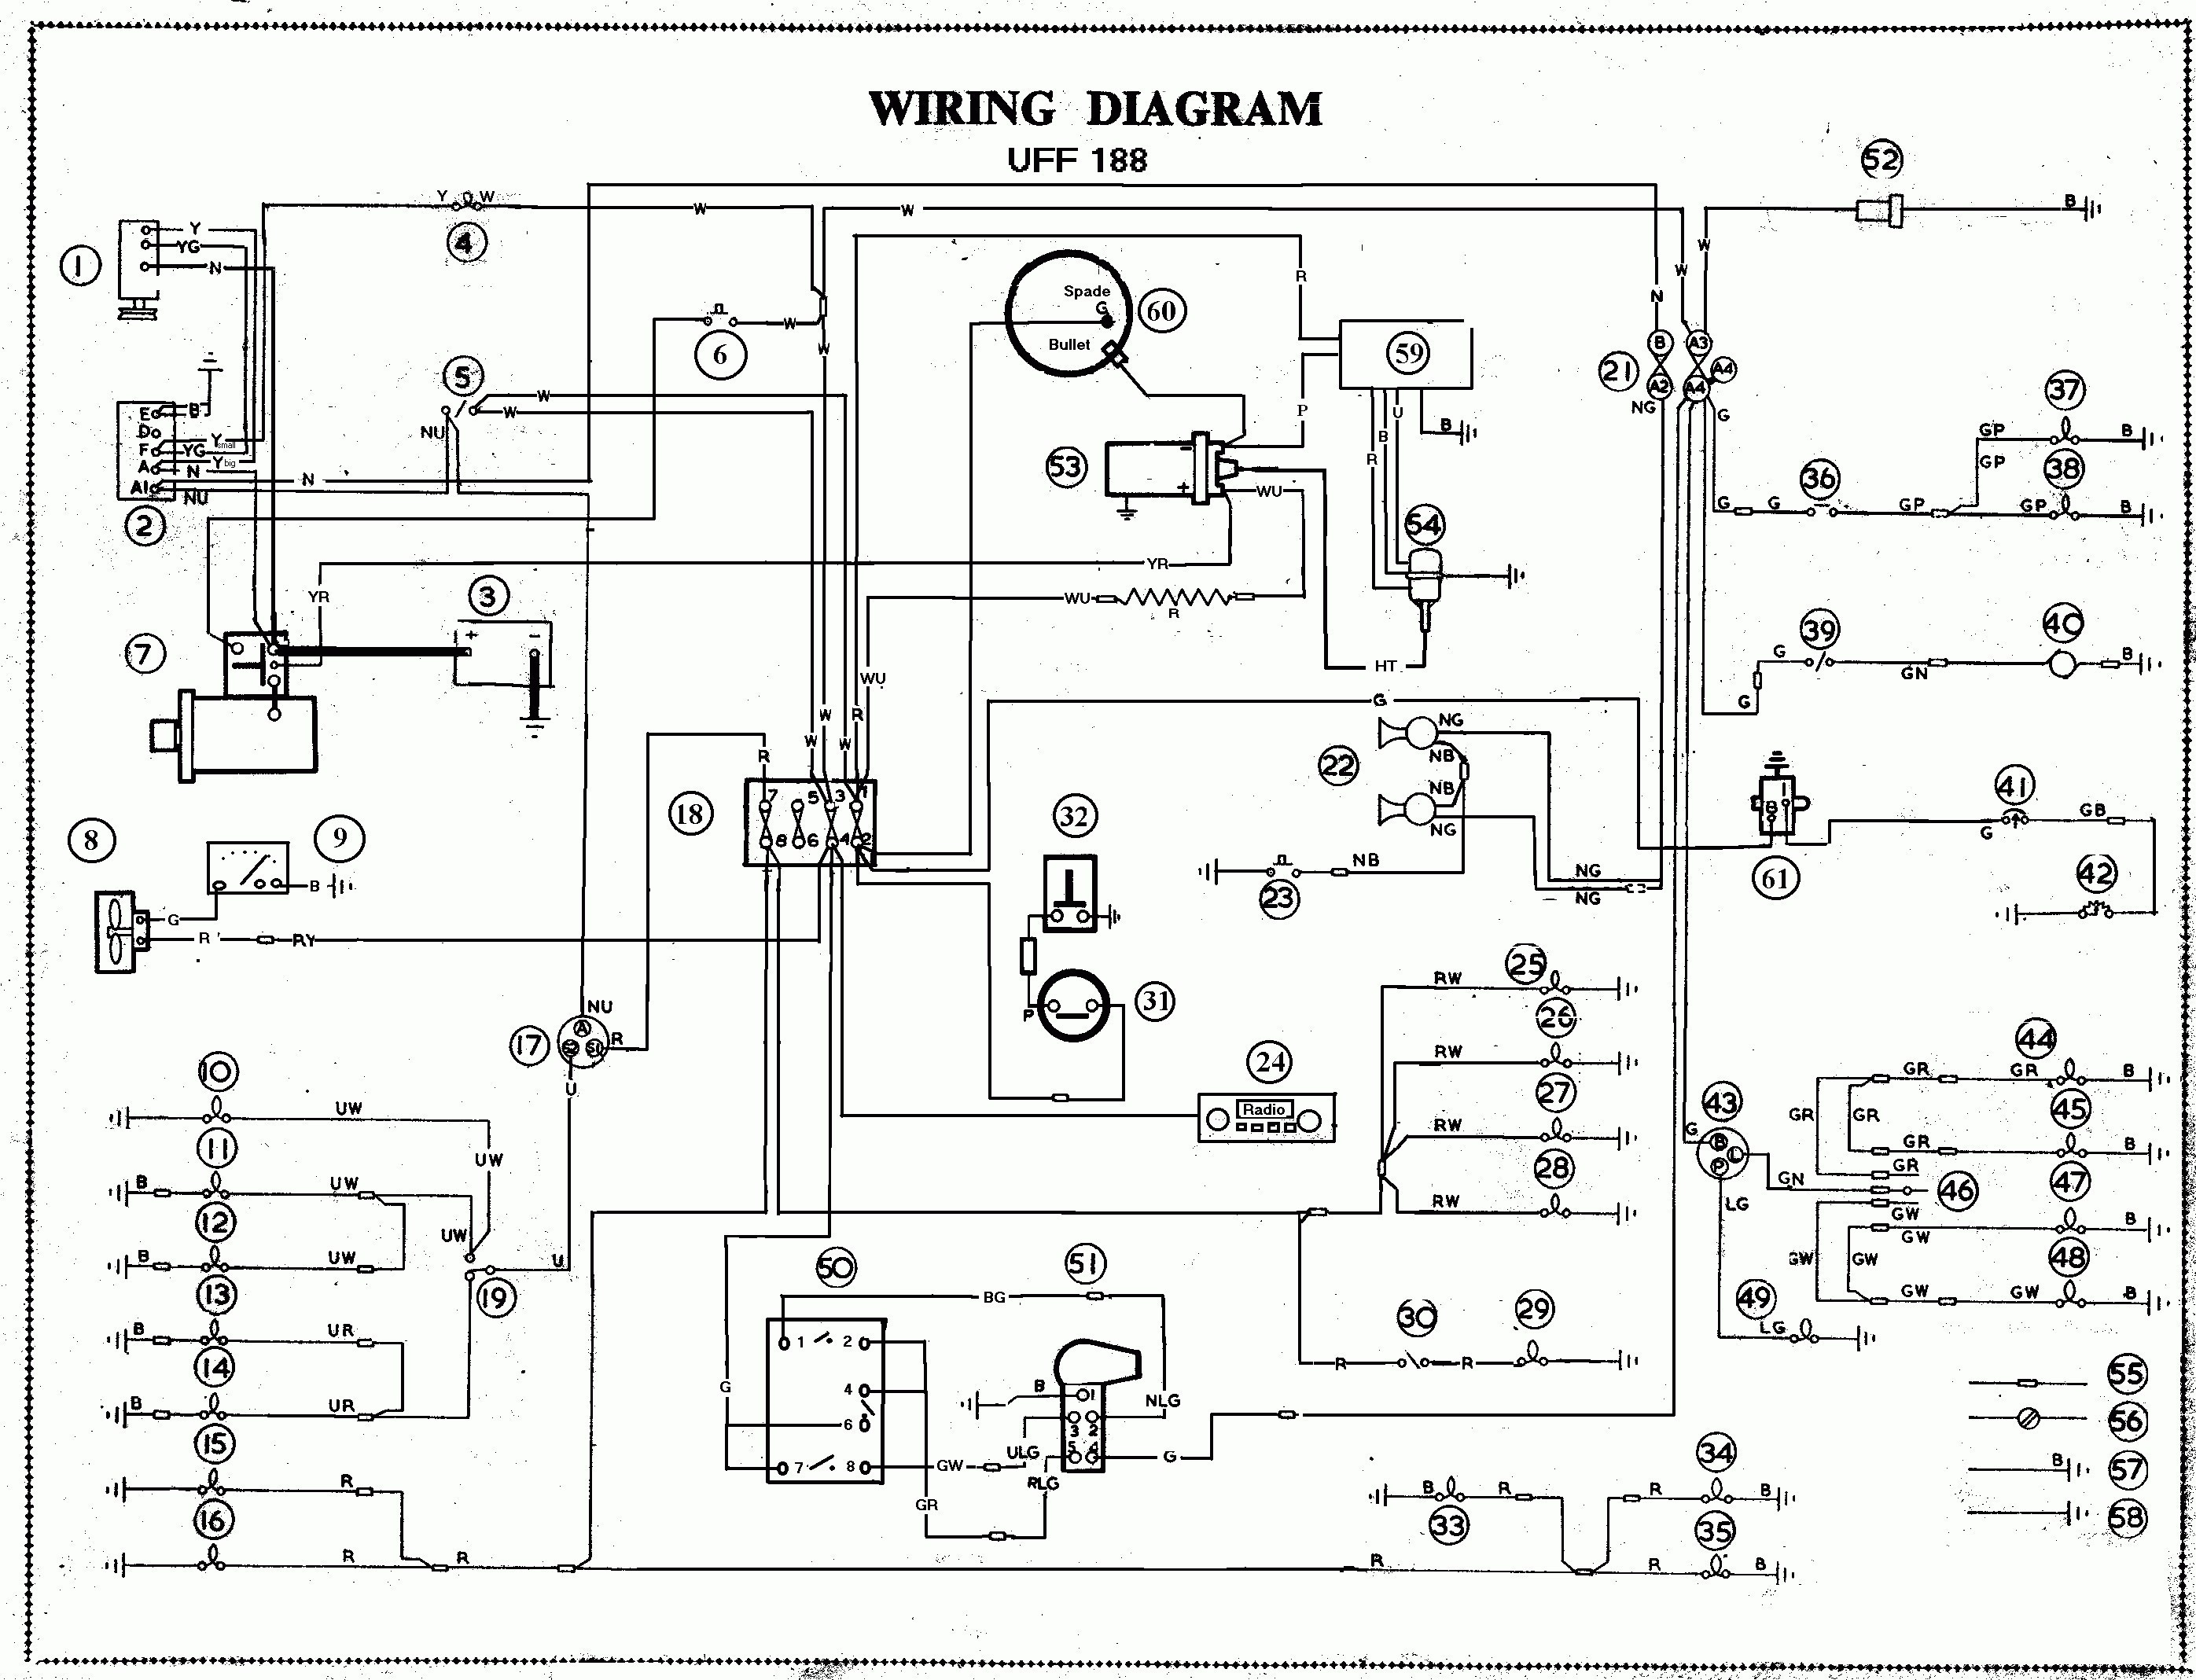 bennington pontoon boat wiring diagram - xs650 simple wiring diagram  electronic ignition for wiring diagram schematics  wiring diagram schematics